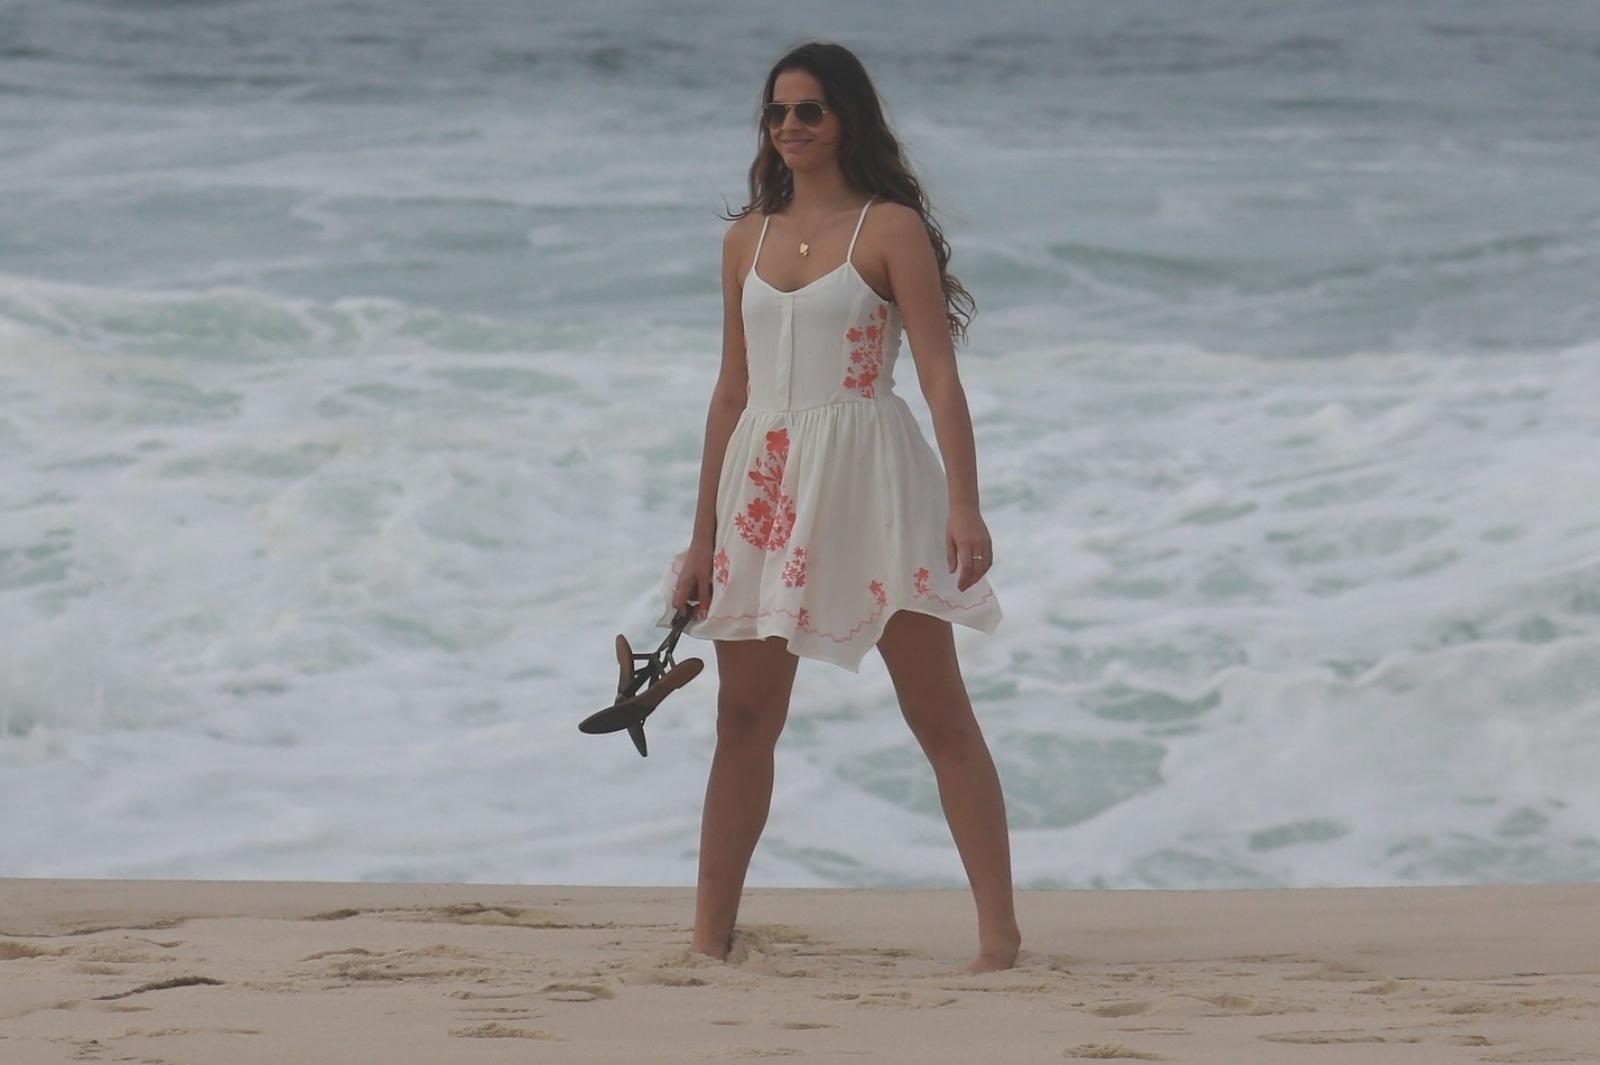 9.jul.2014 - Bruna Marquezine grava cena como Luiza na praia Recreio dos Bandeirantes, no Rio, para a novela